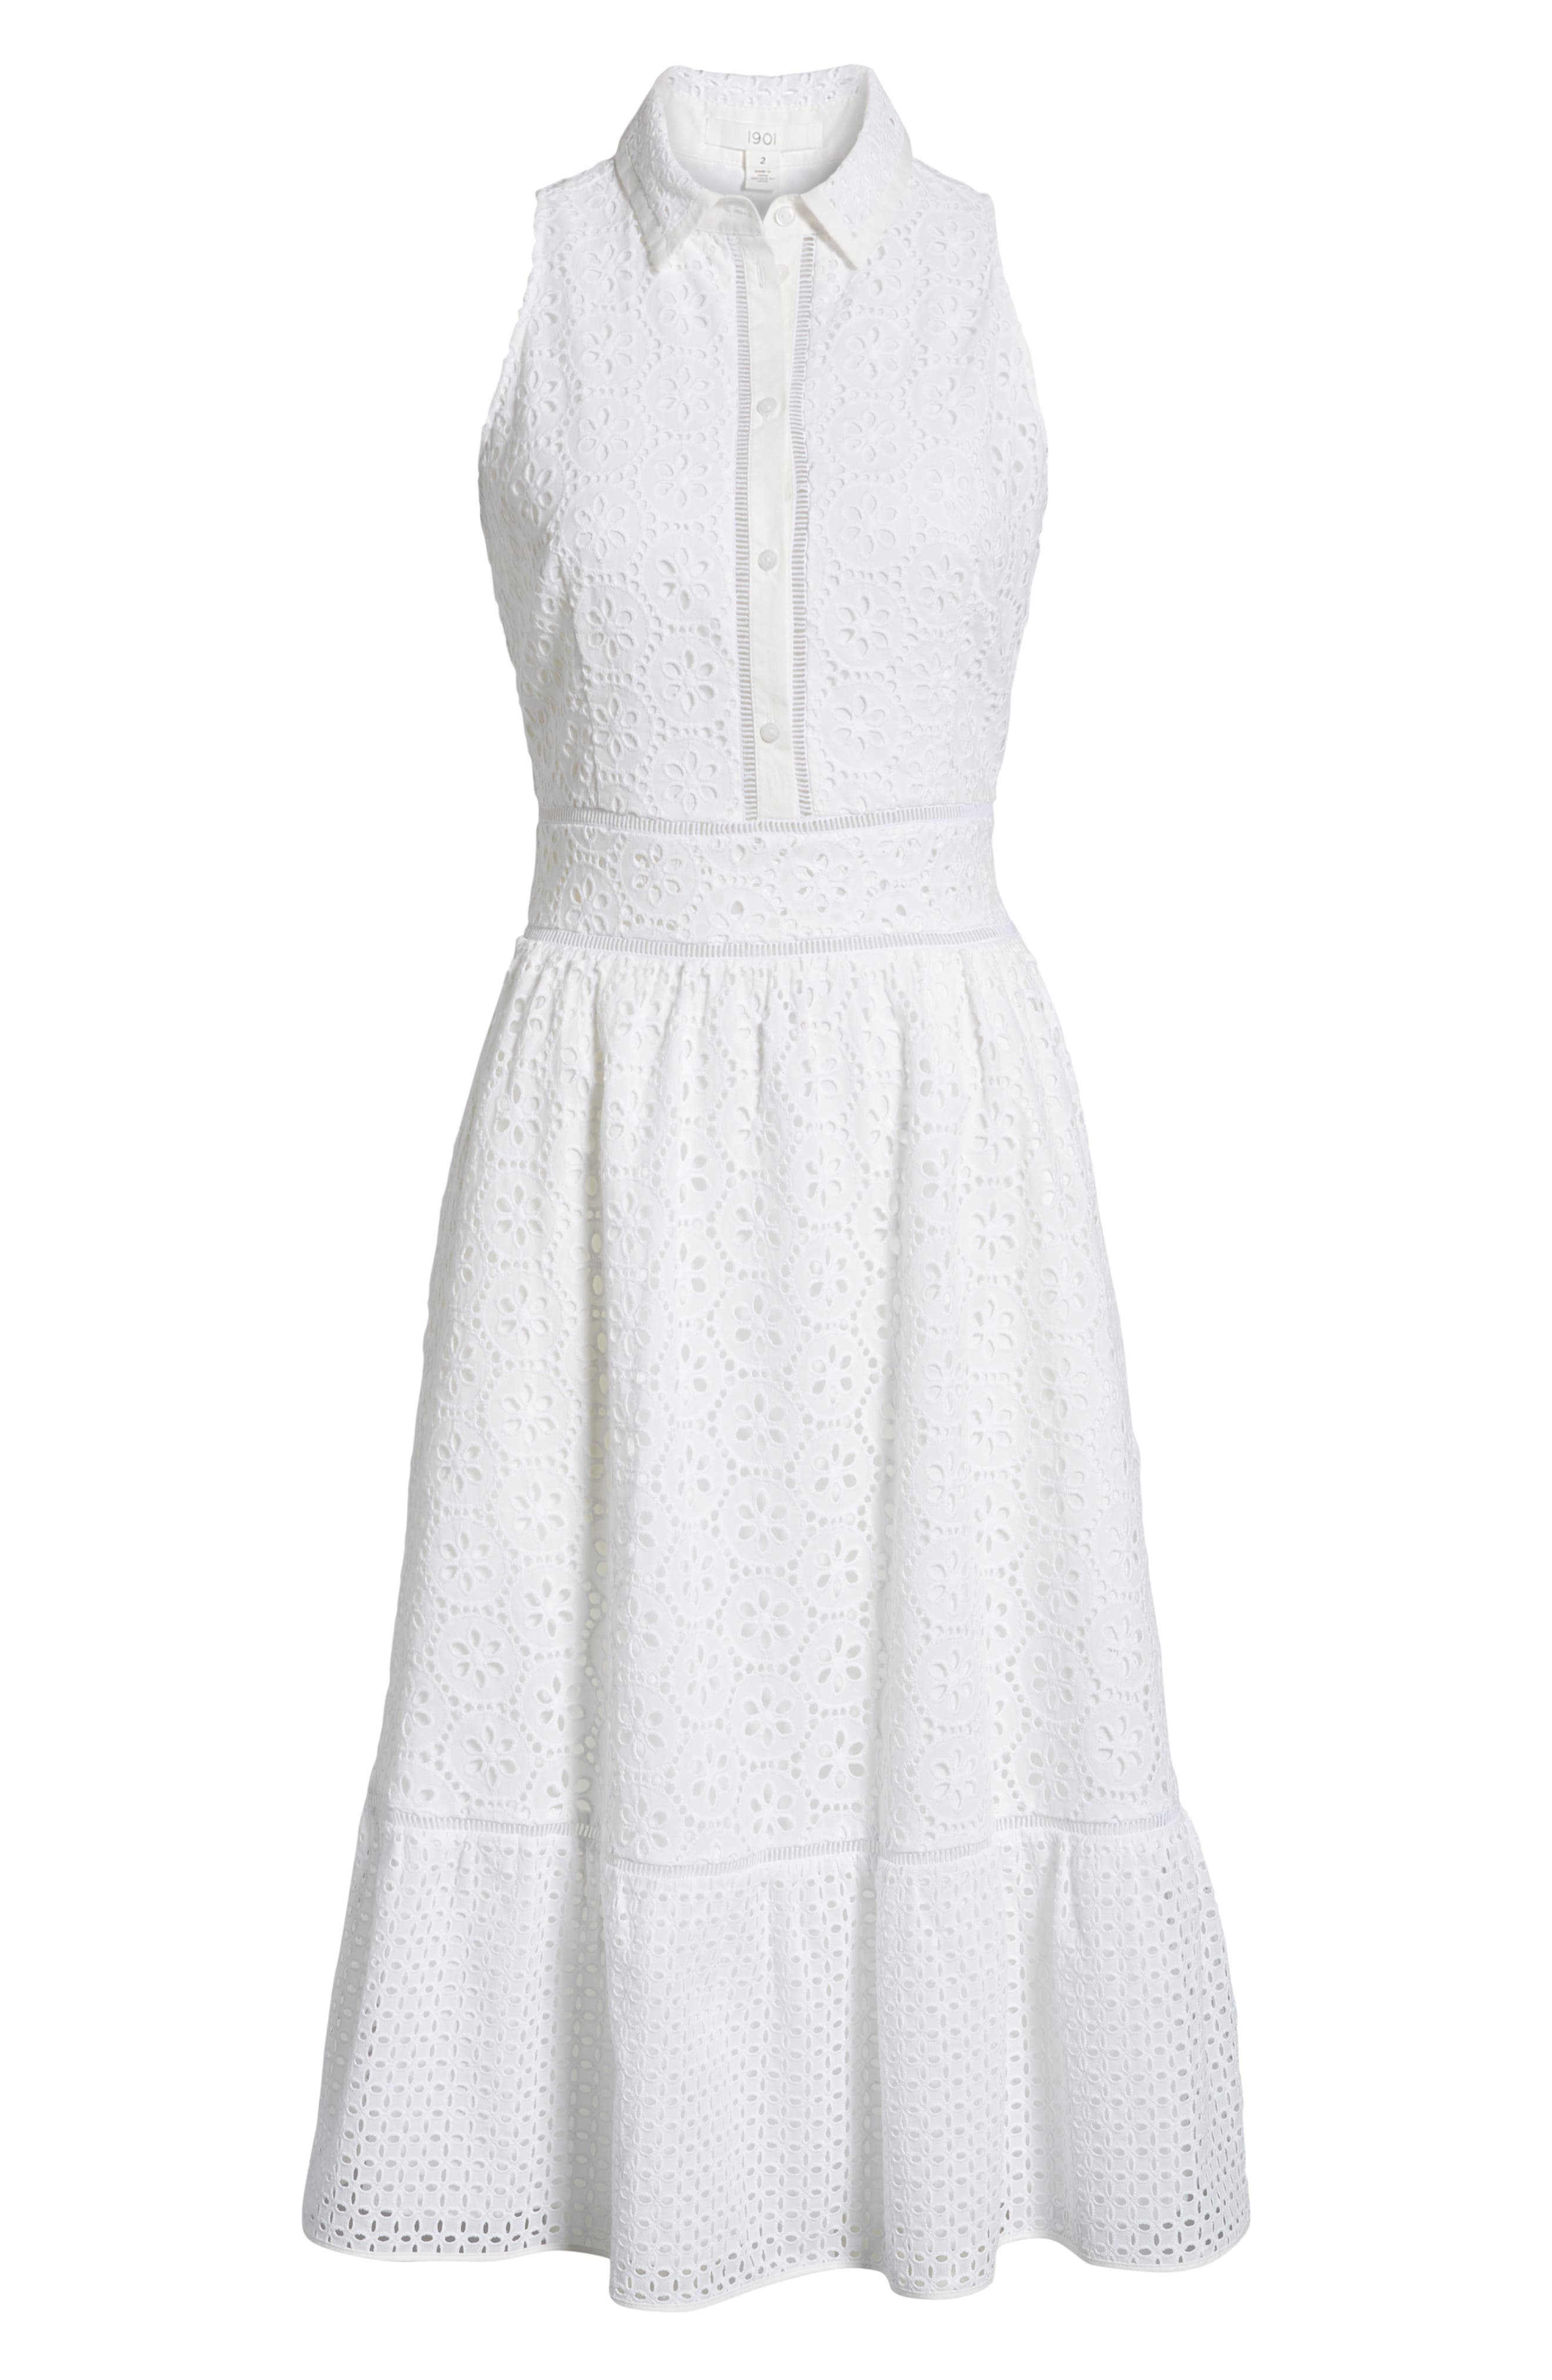 Cotton Eyelet Sleeveless Shirtdress,                             Alternate thumbnail 7, color,                             White